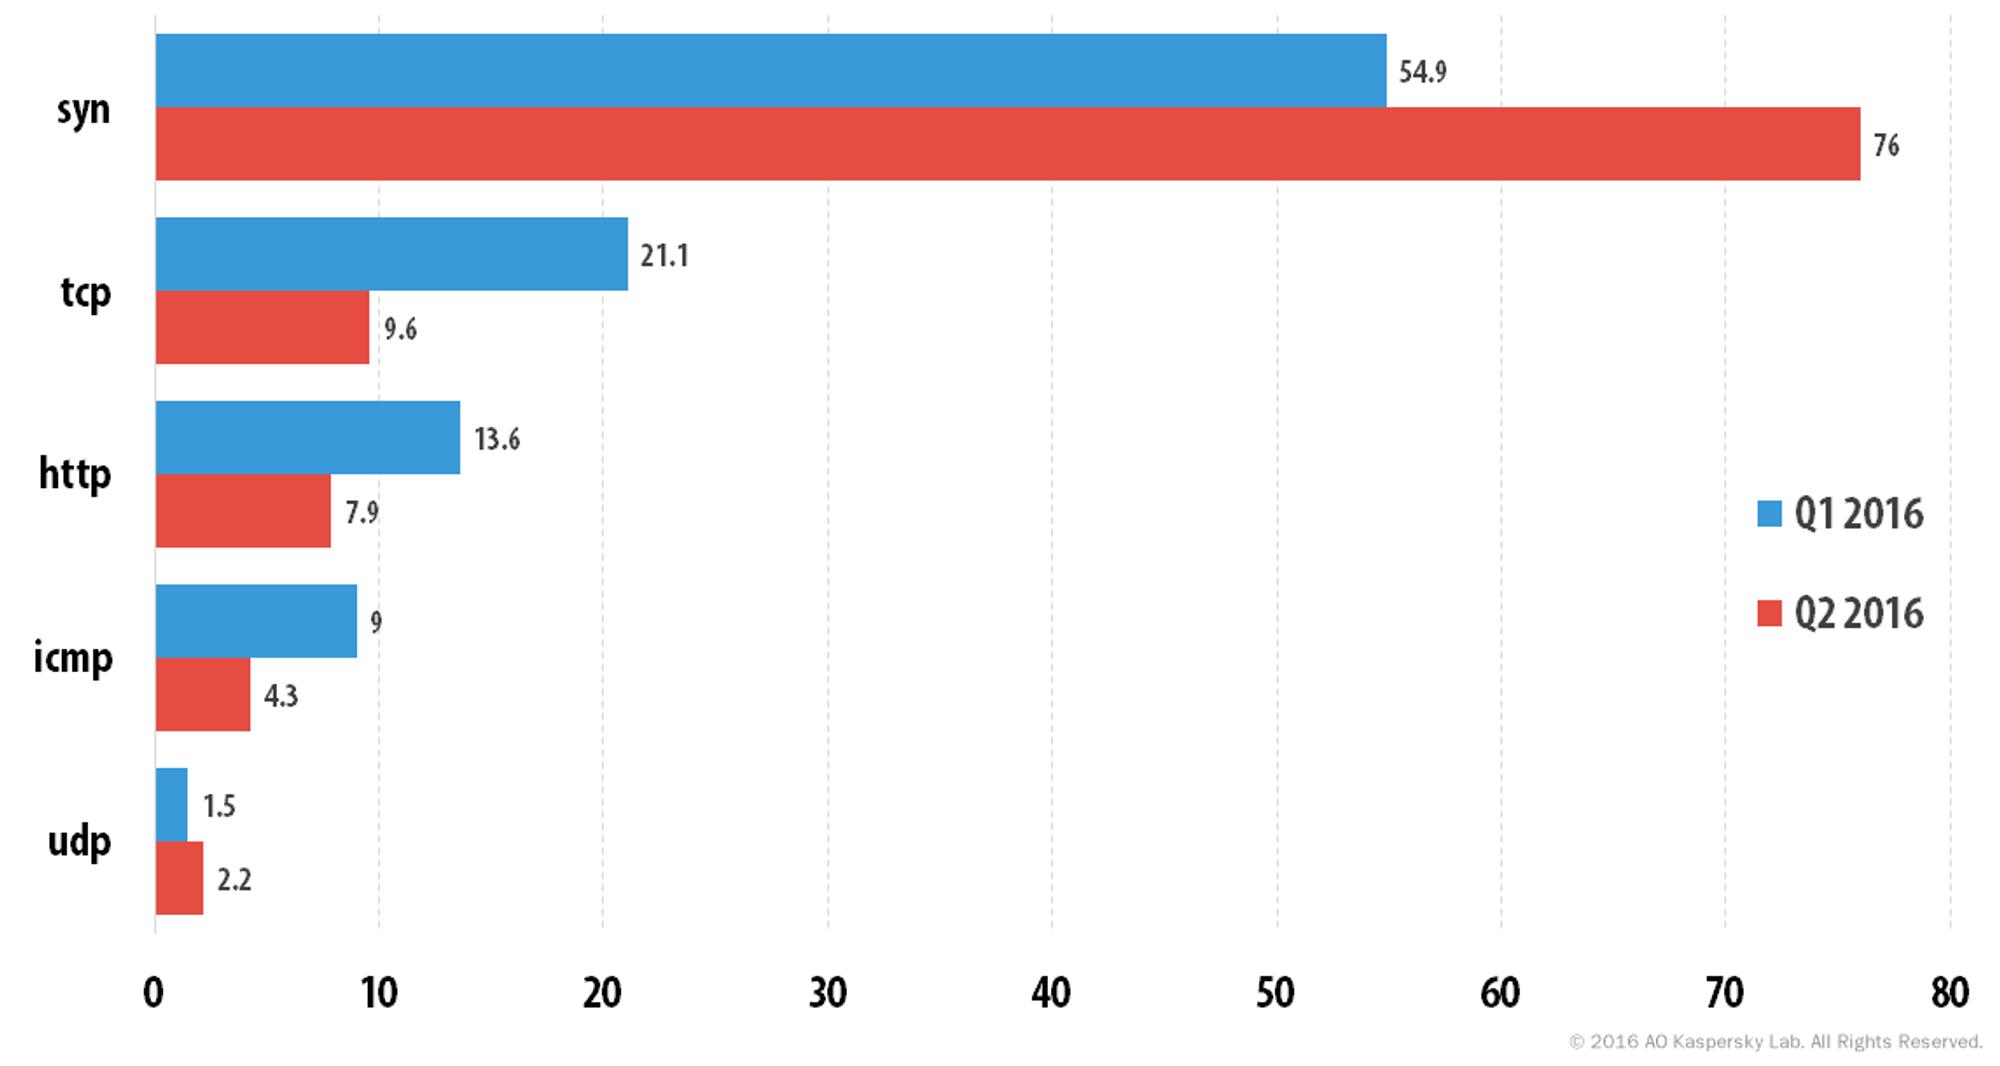 Endring i andelen til ulike typer DDoS-angrep fra første til andre kvartal i 2016.